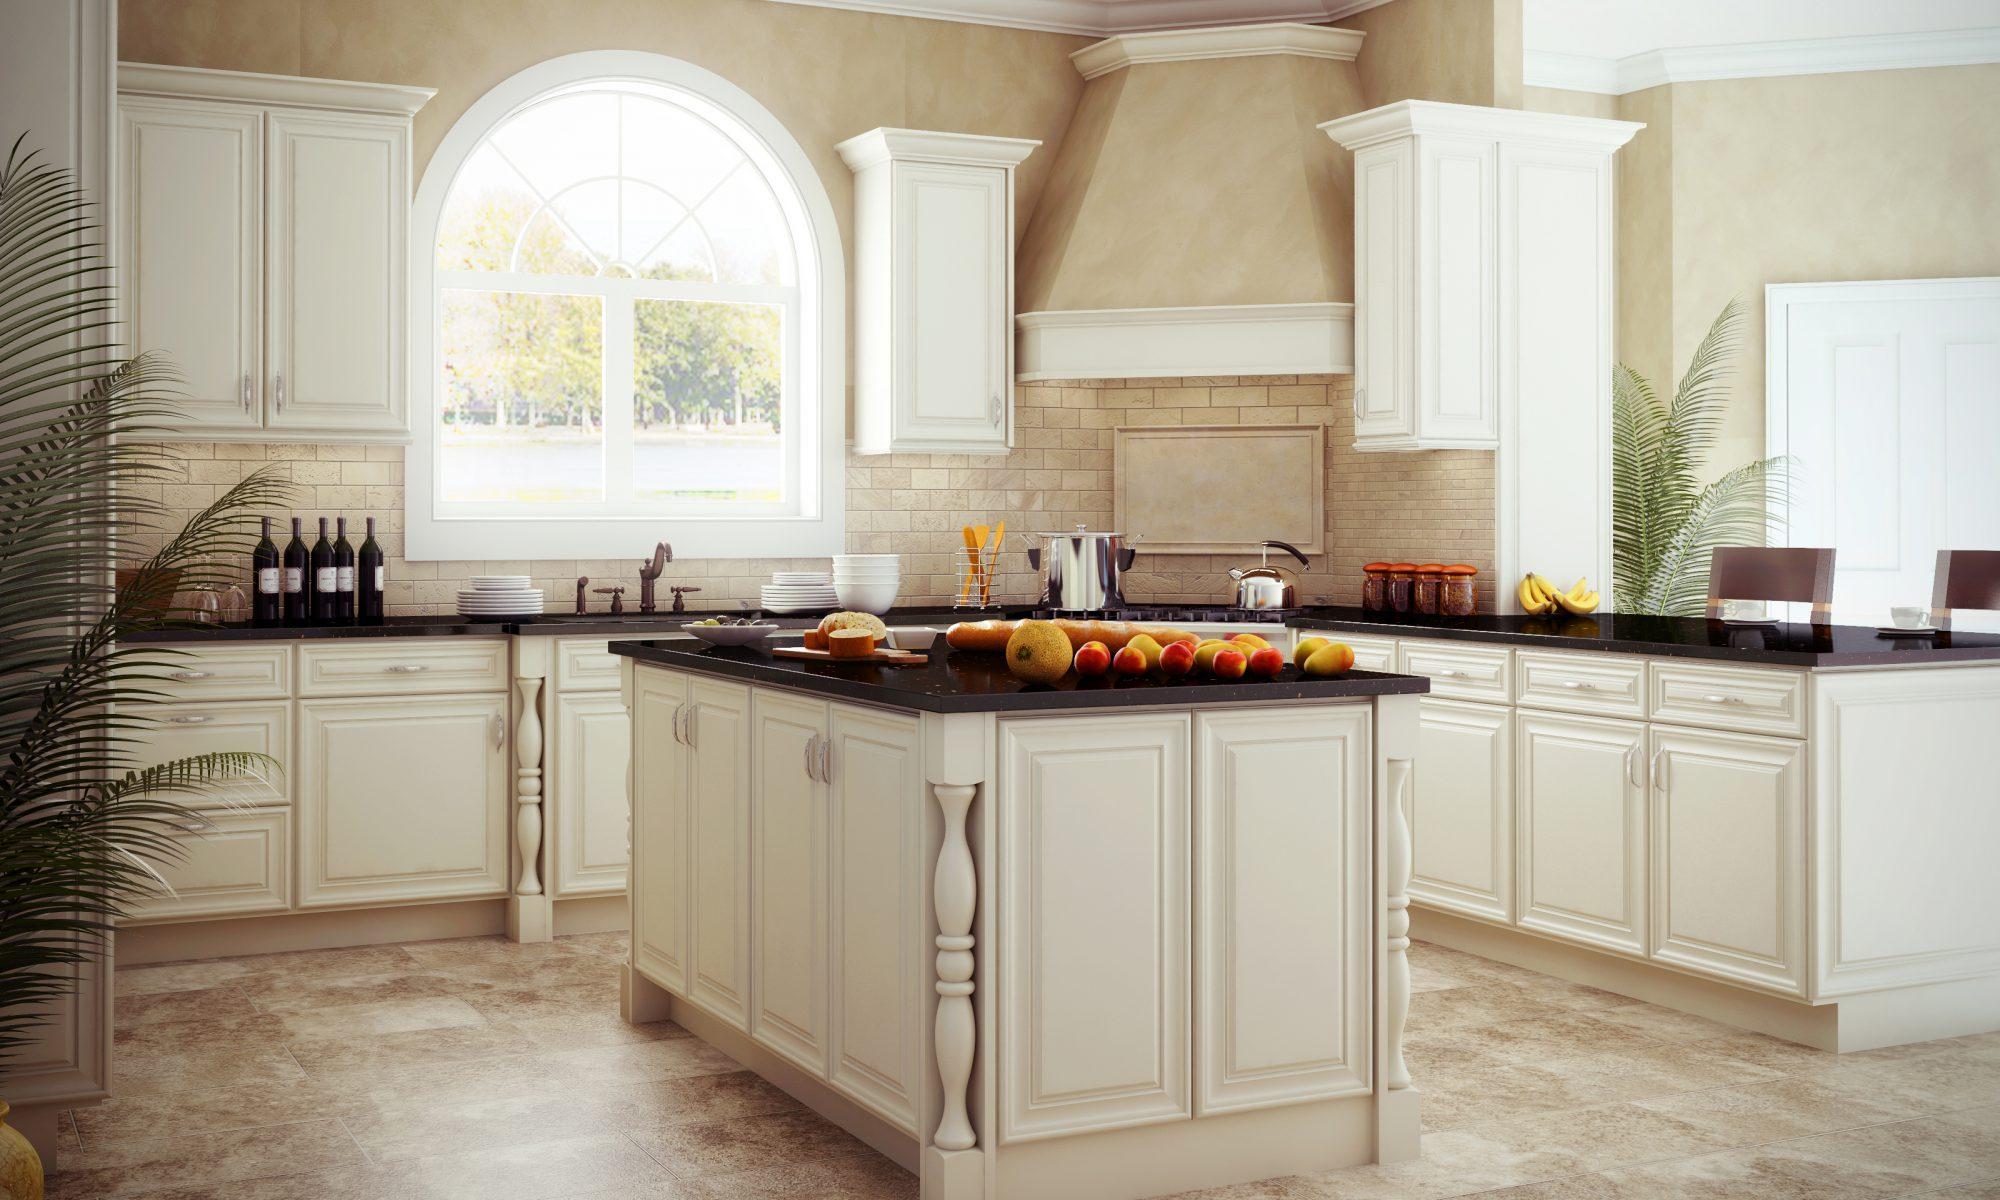 Quality Granite & Cabinets NH